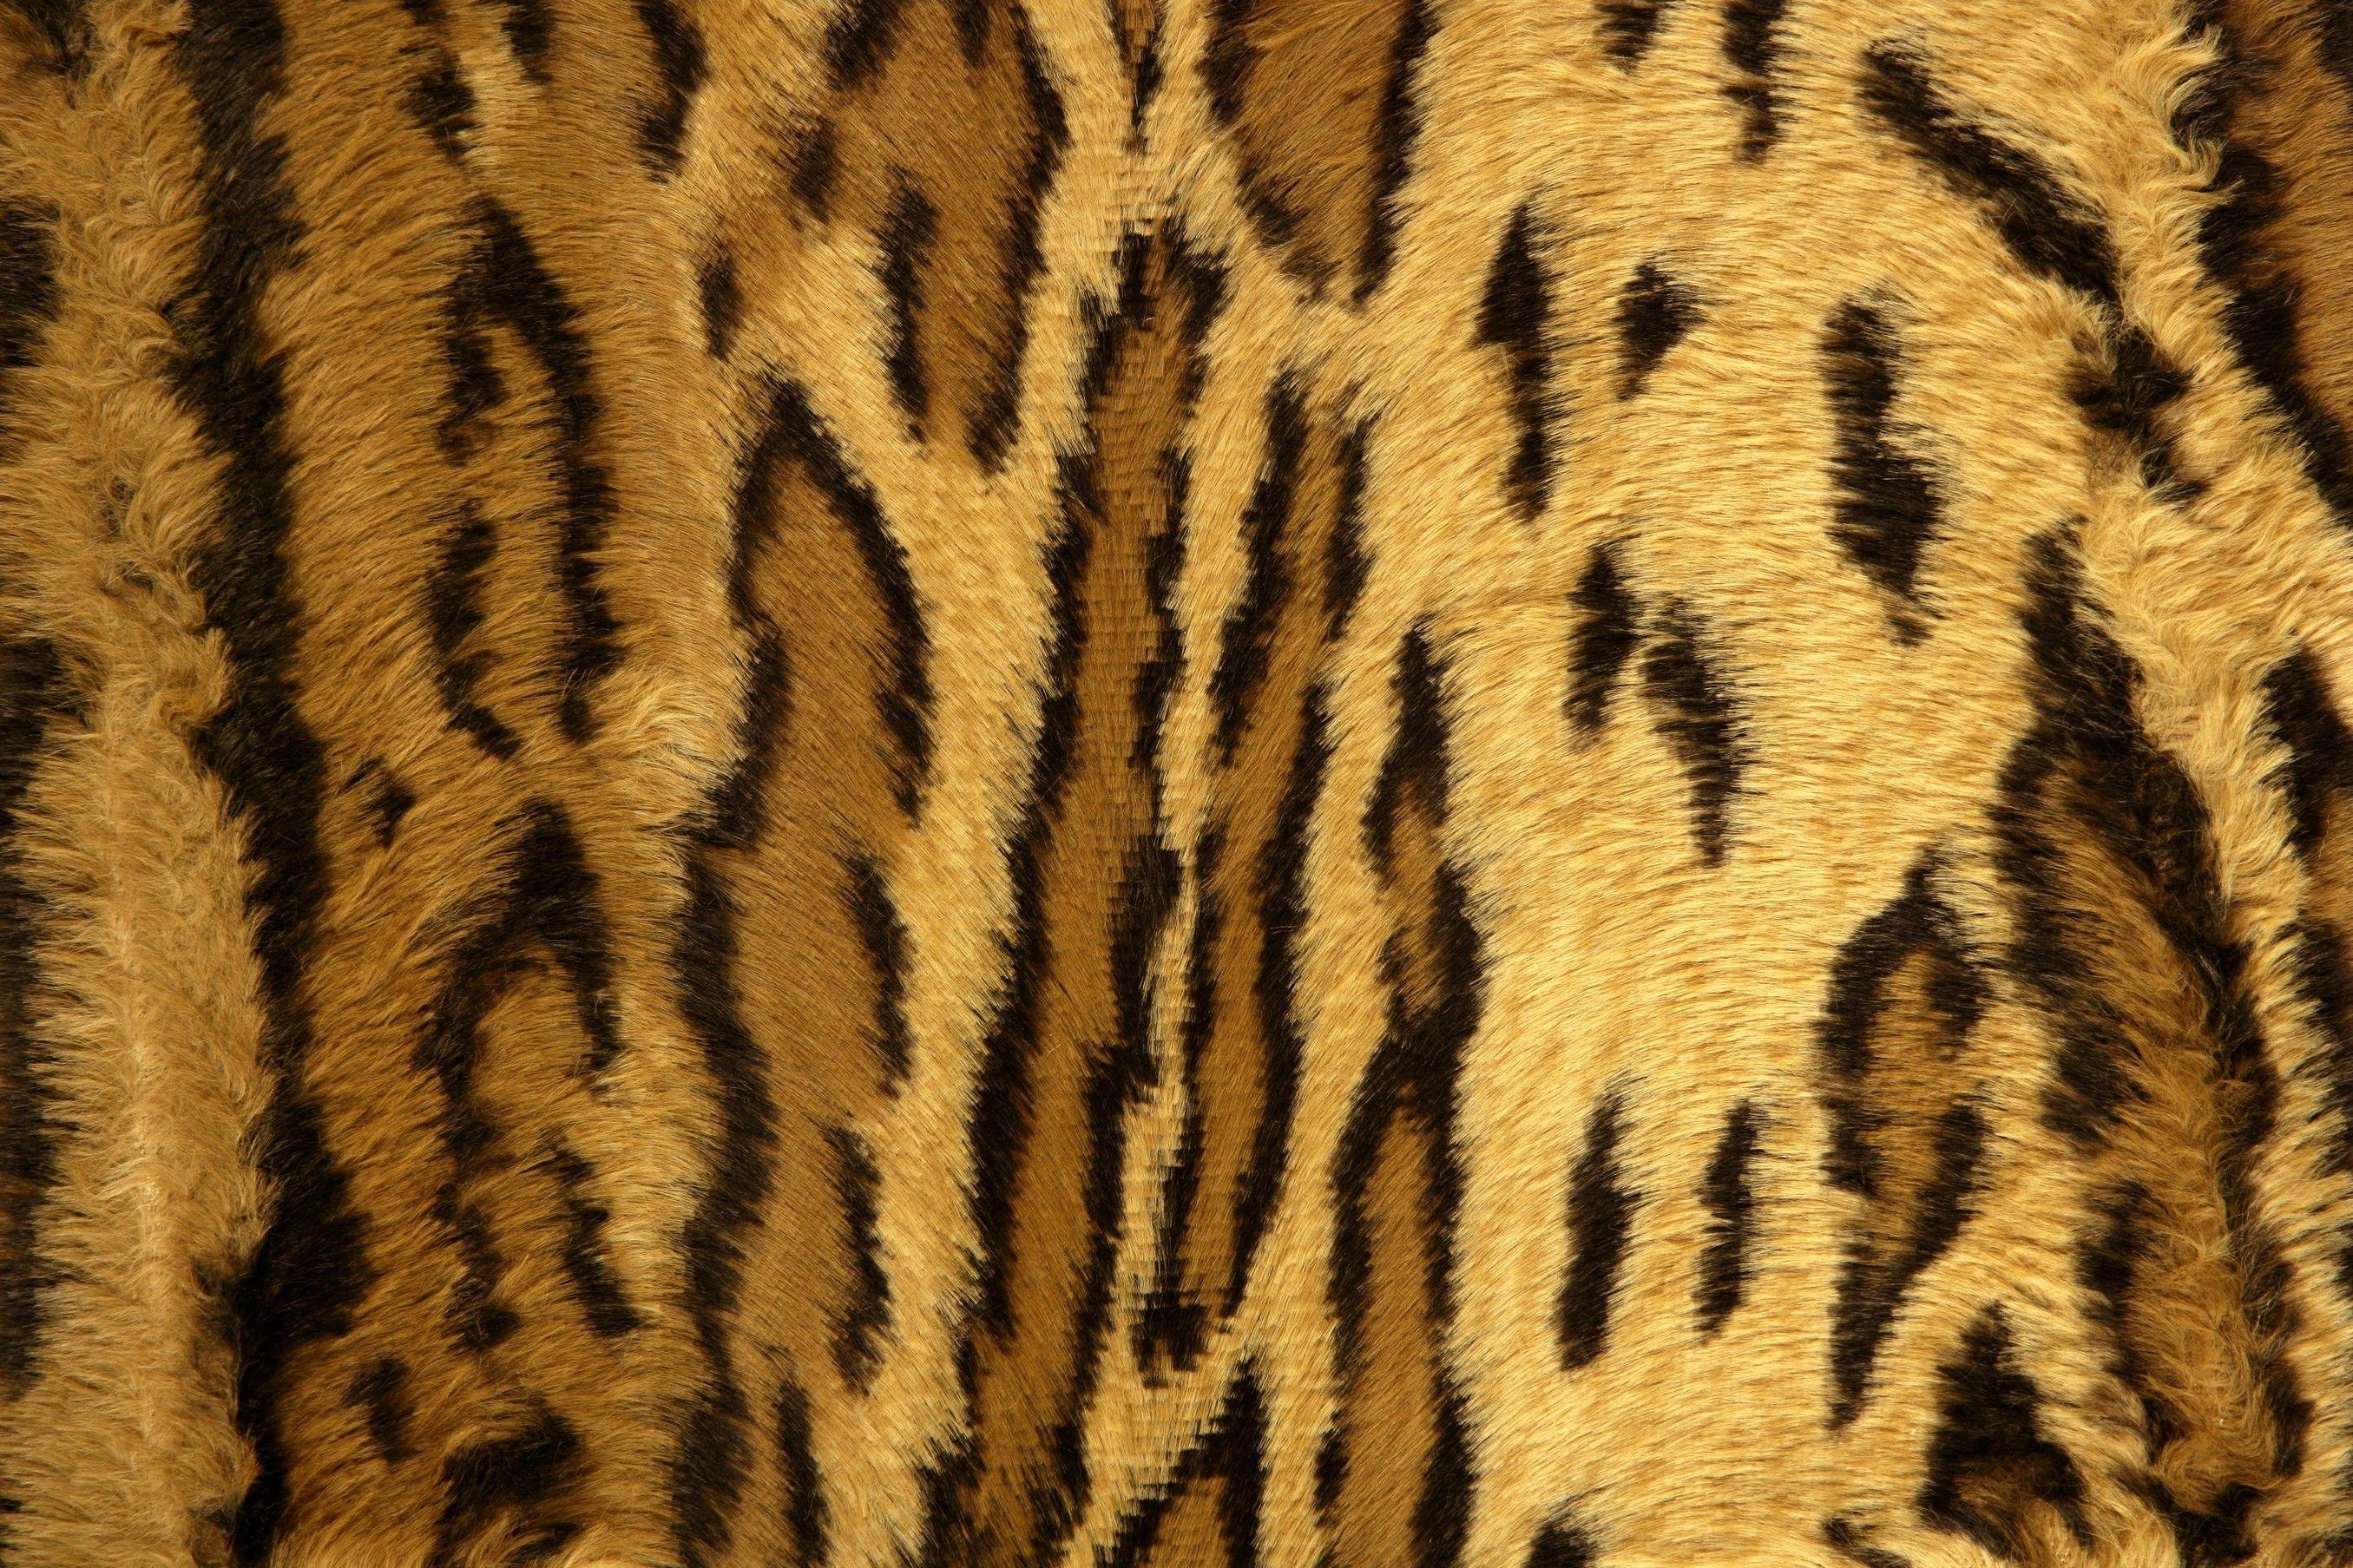 2711x1807 Wild Lifes Africa Cheetah Print